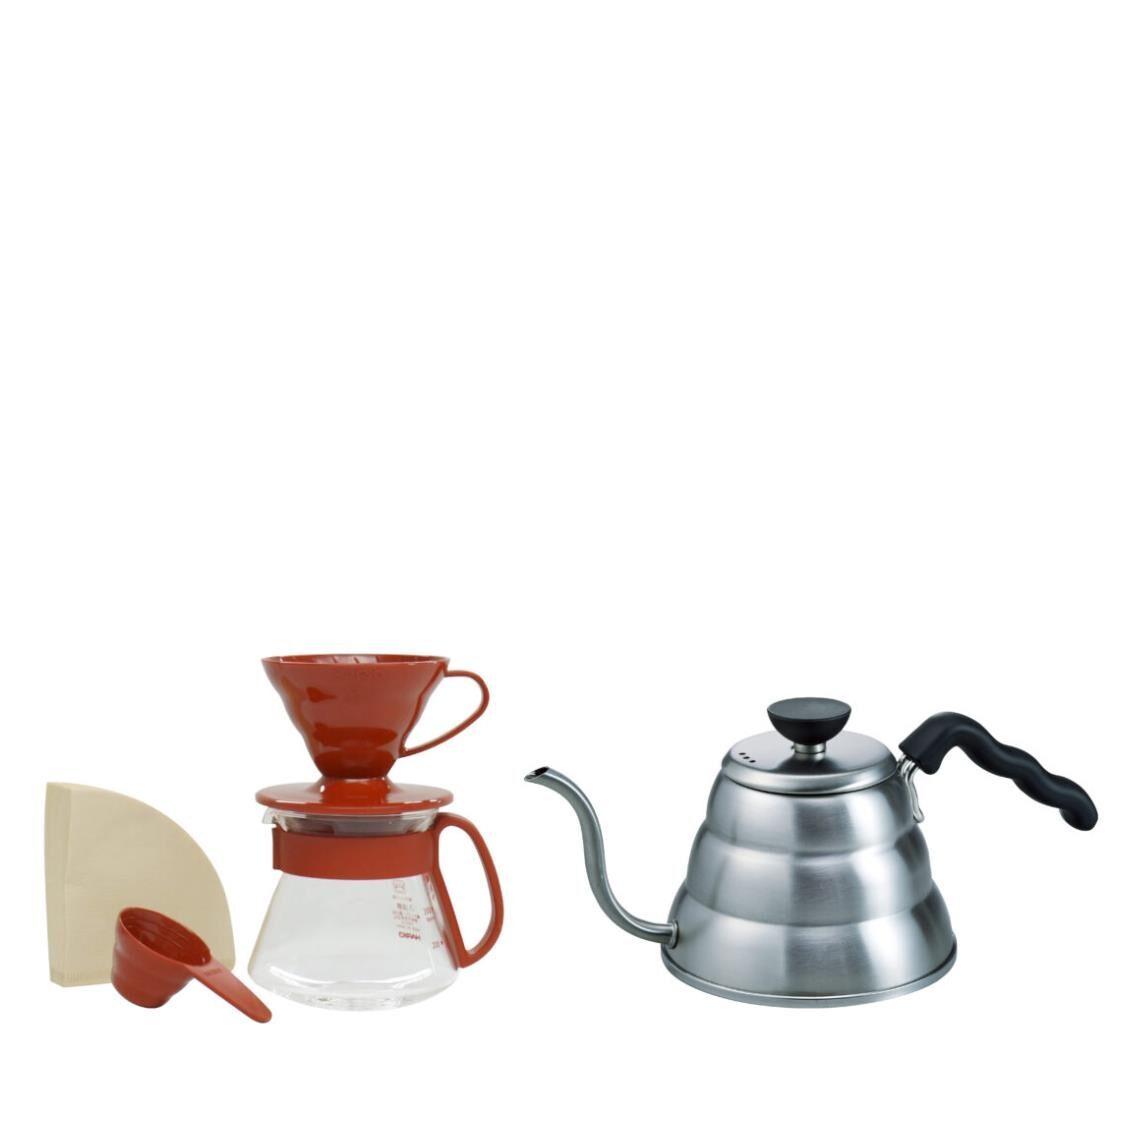 Hario V60 Craft Coffee Maker Set - White  VDSP-2012R-EX  VKB-100HSV